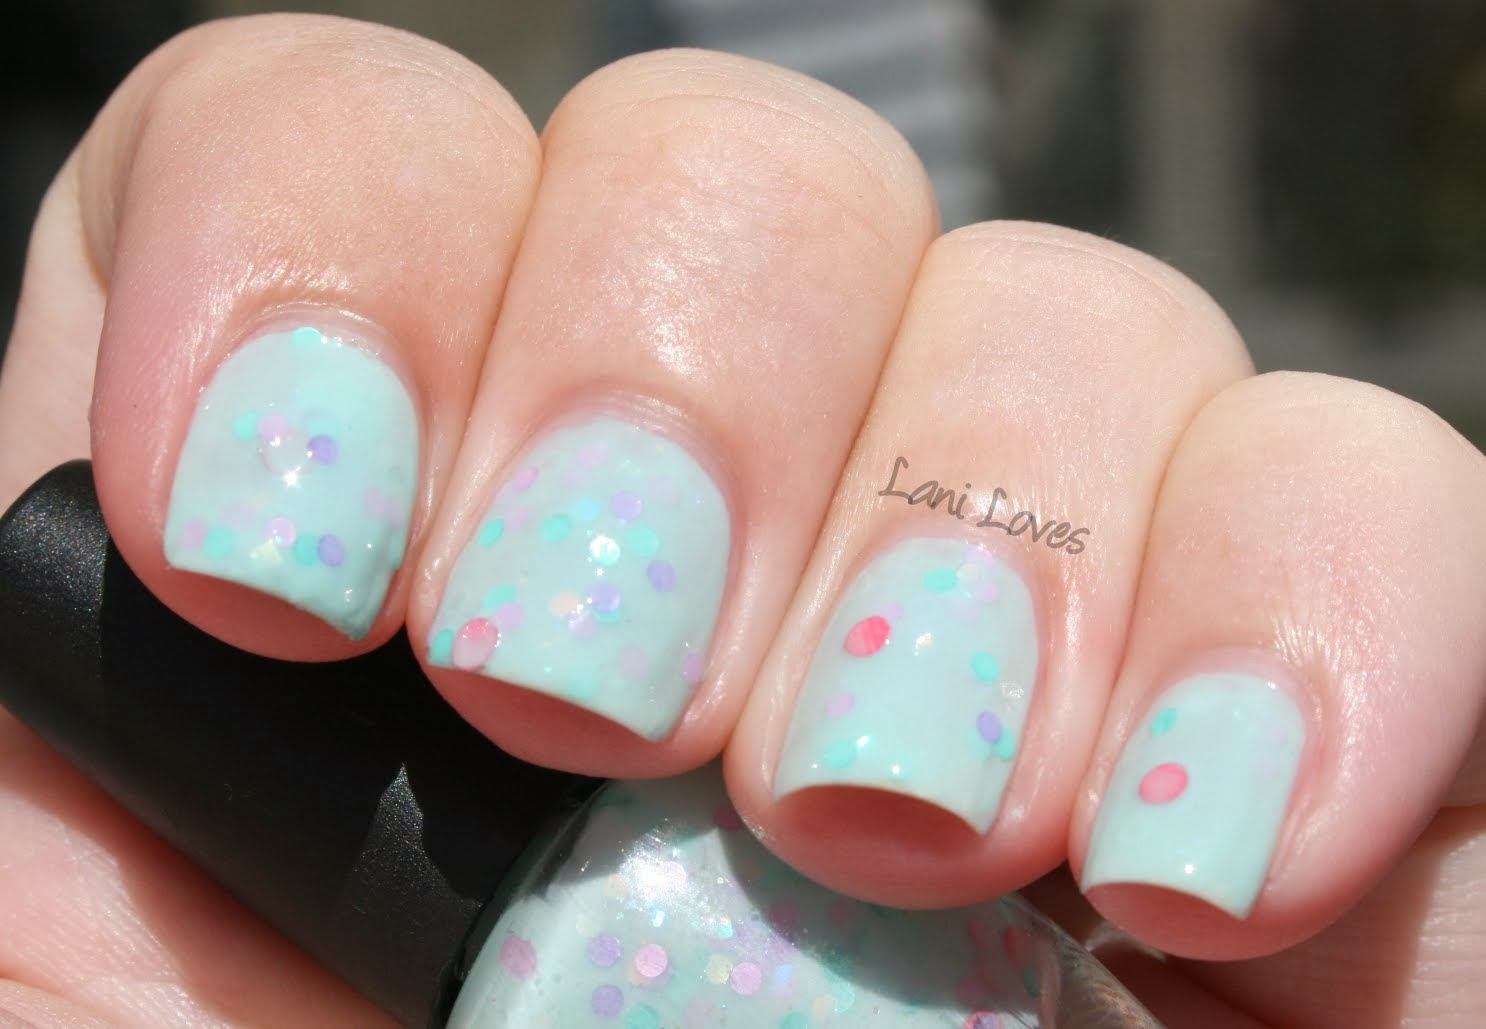 Star Kin Fairy Biscuit Swatch